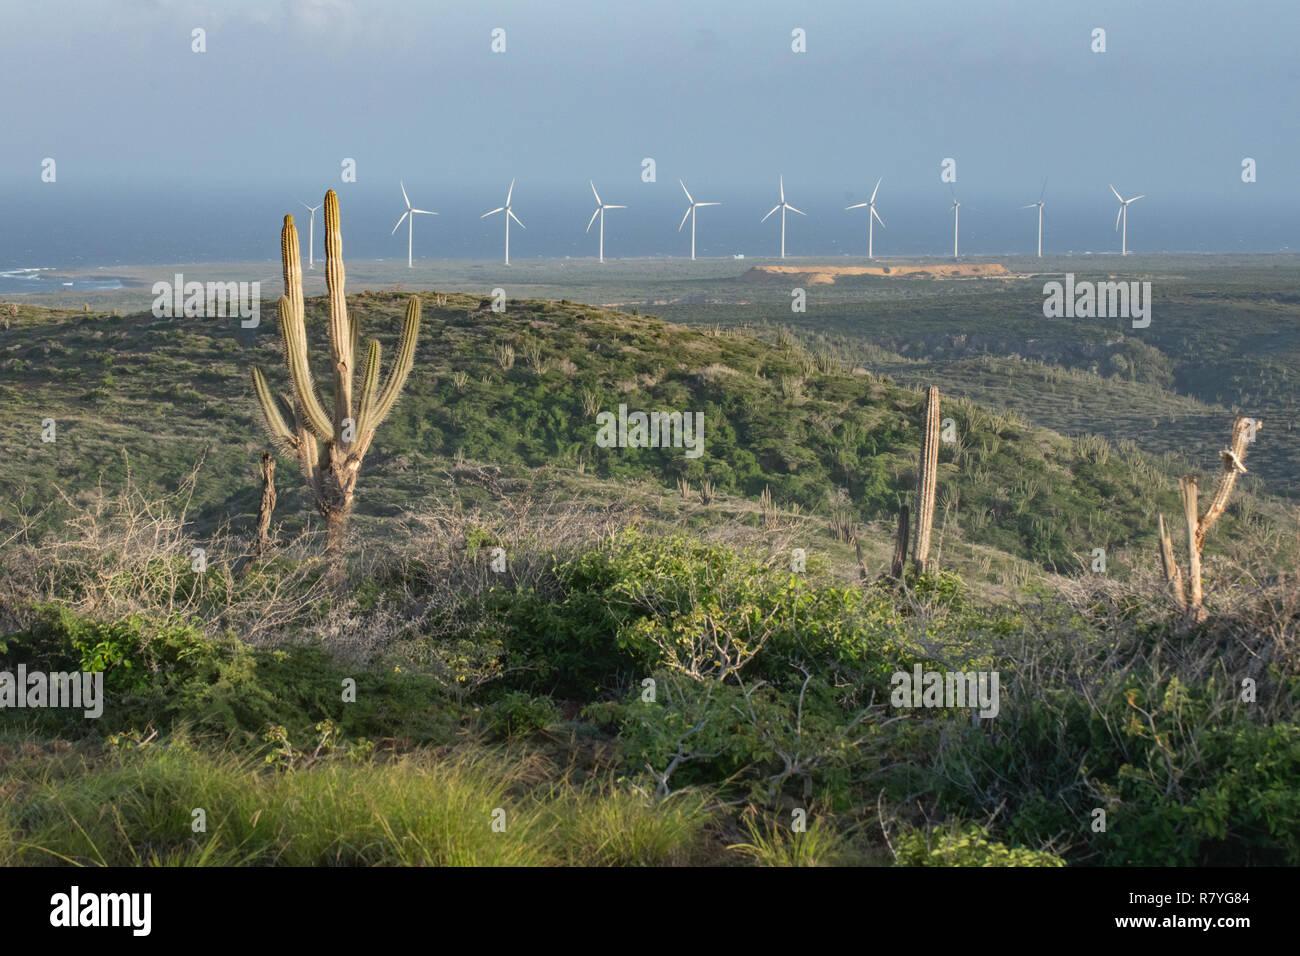 Windmill farm Aruba in Arikok National Park - sustainability effort from wind power - wind turbines form a wind farm to increase renewable energy - Stock Image